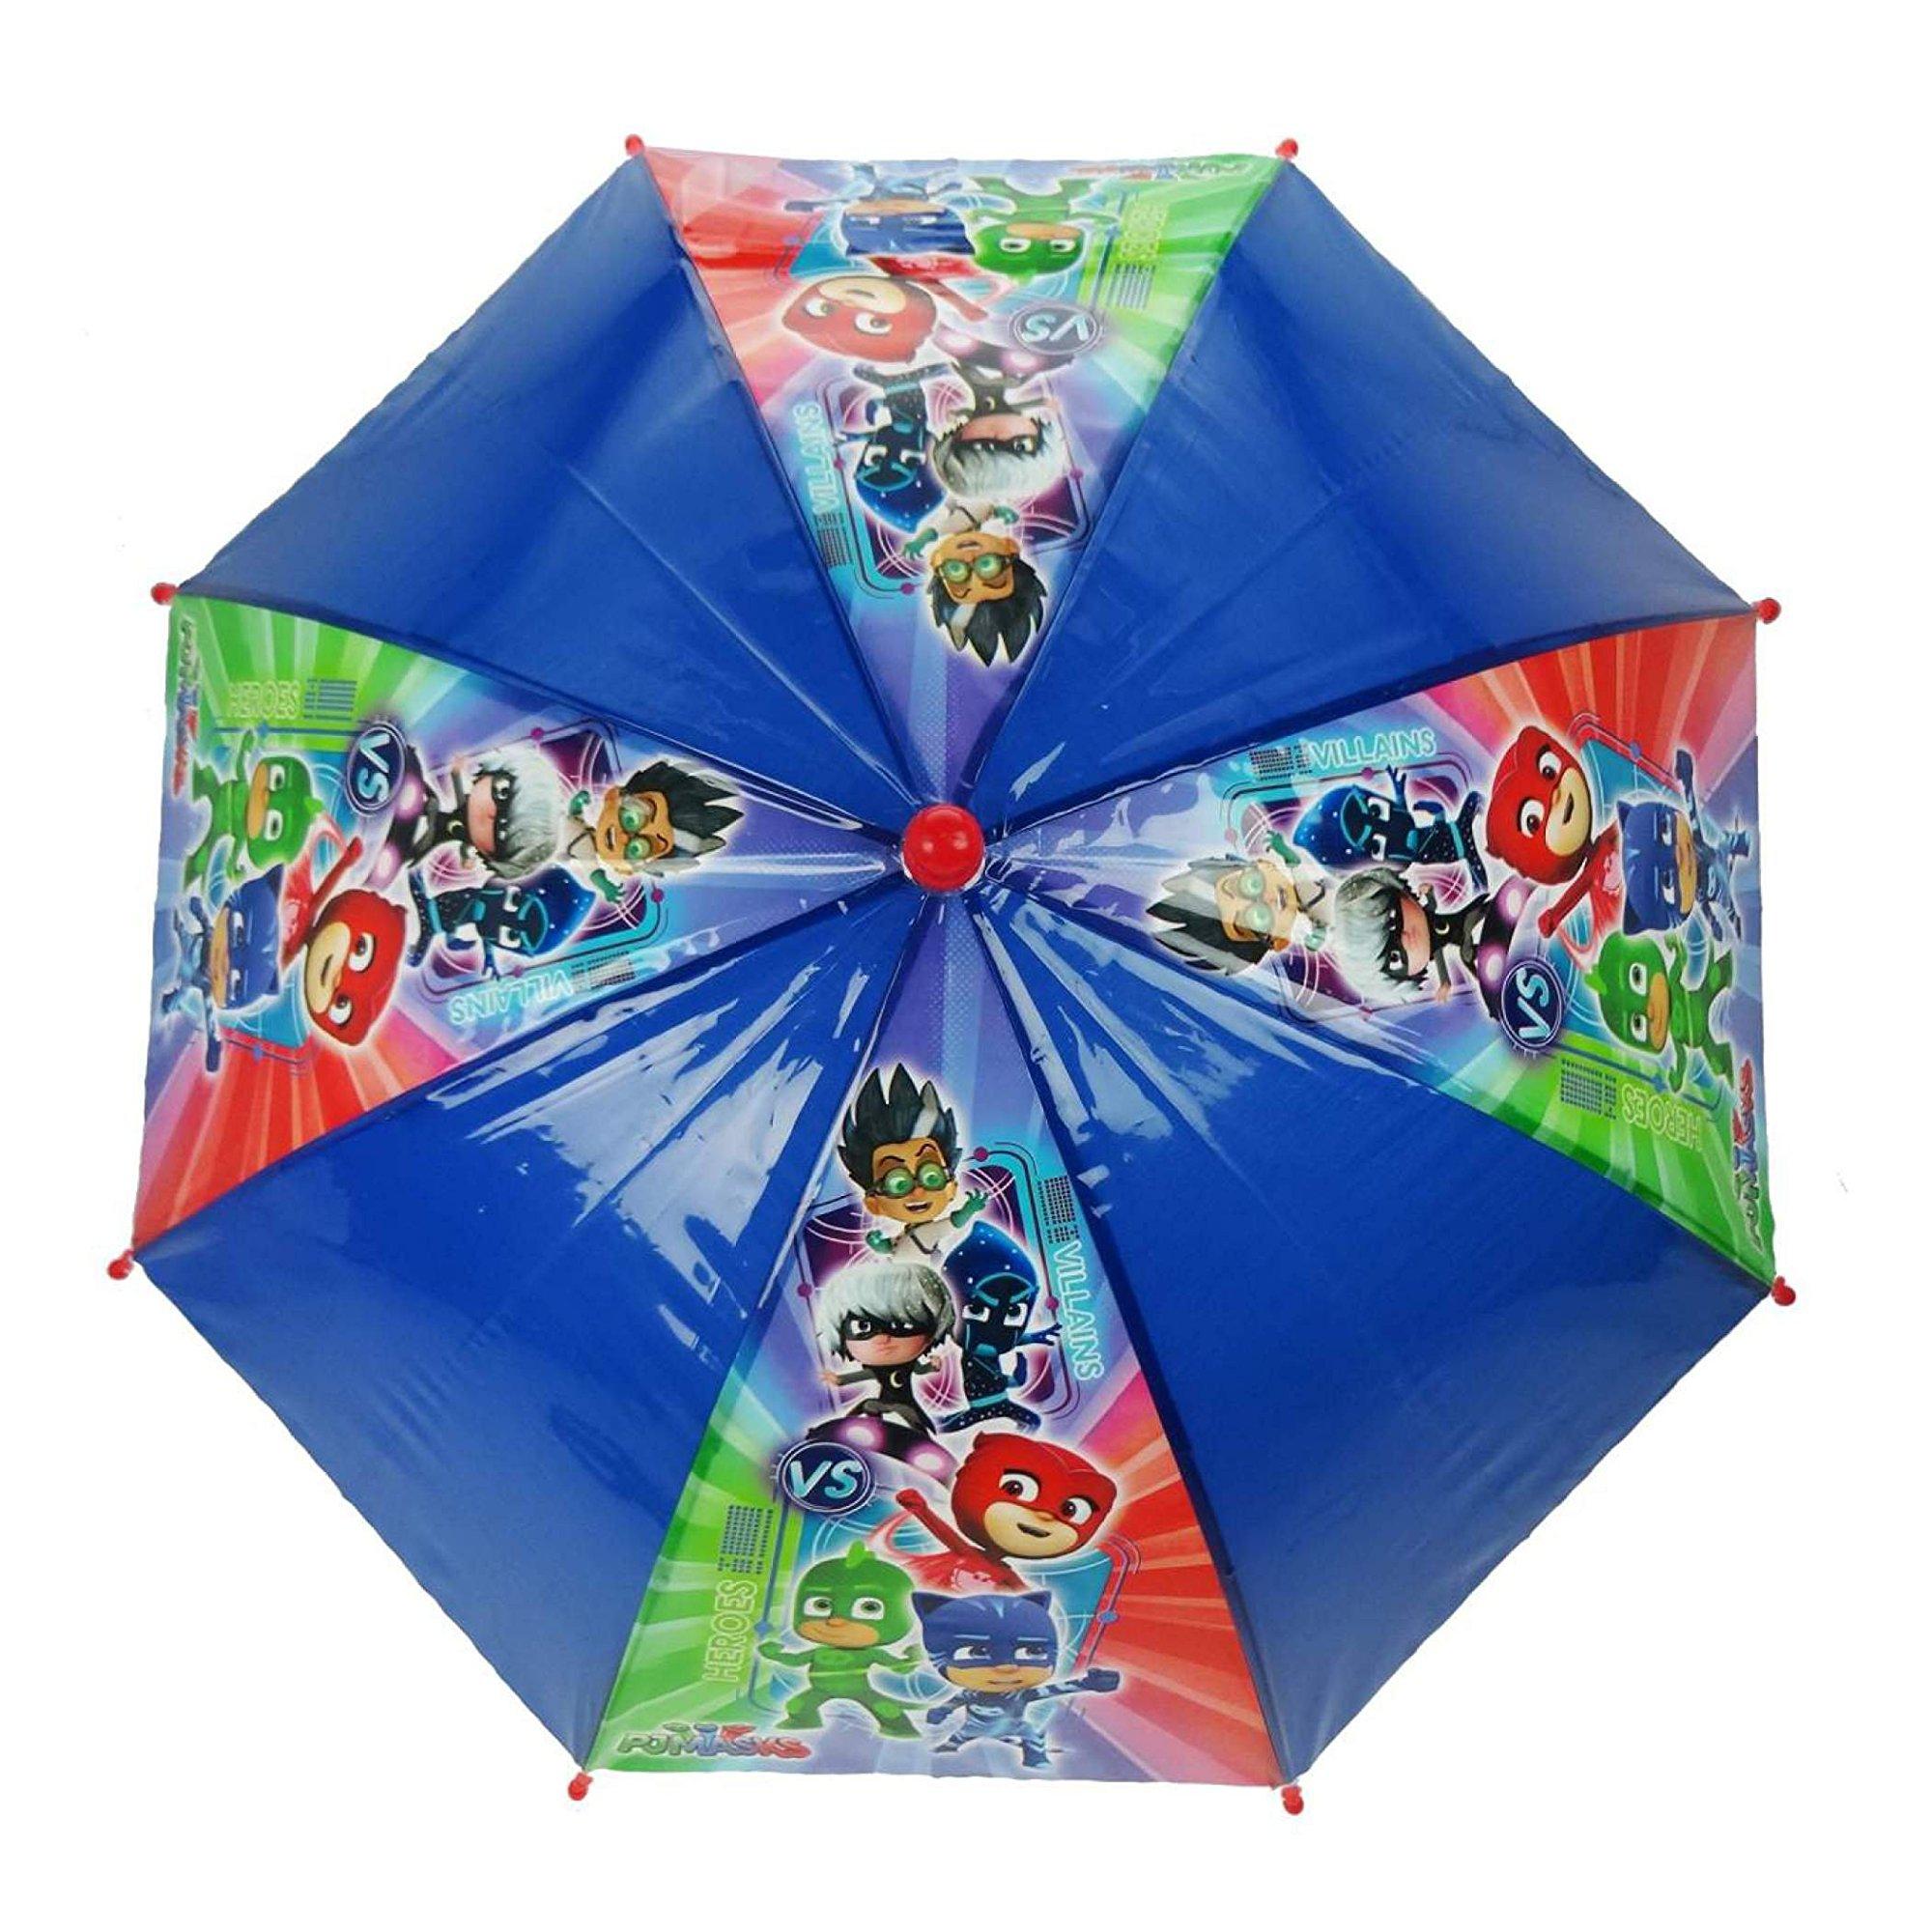 Disney Pj Masks 'It' S Time To Be Hero' School Rain Brolly Umbrella